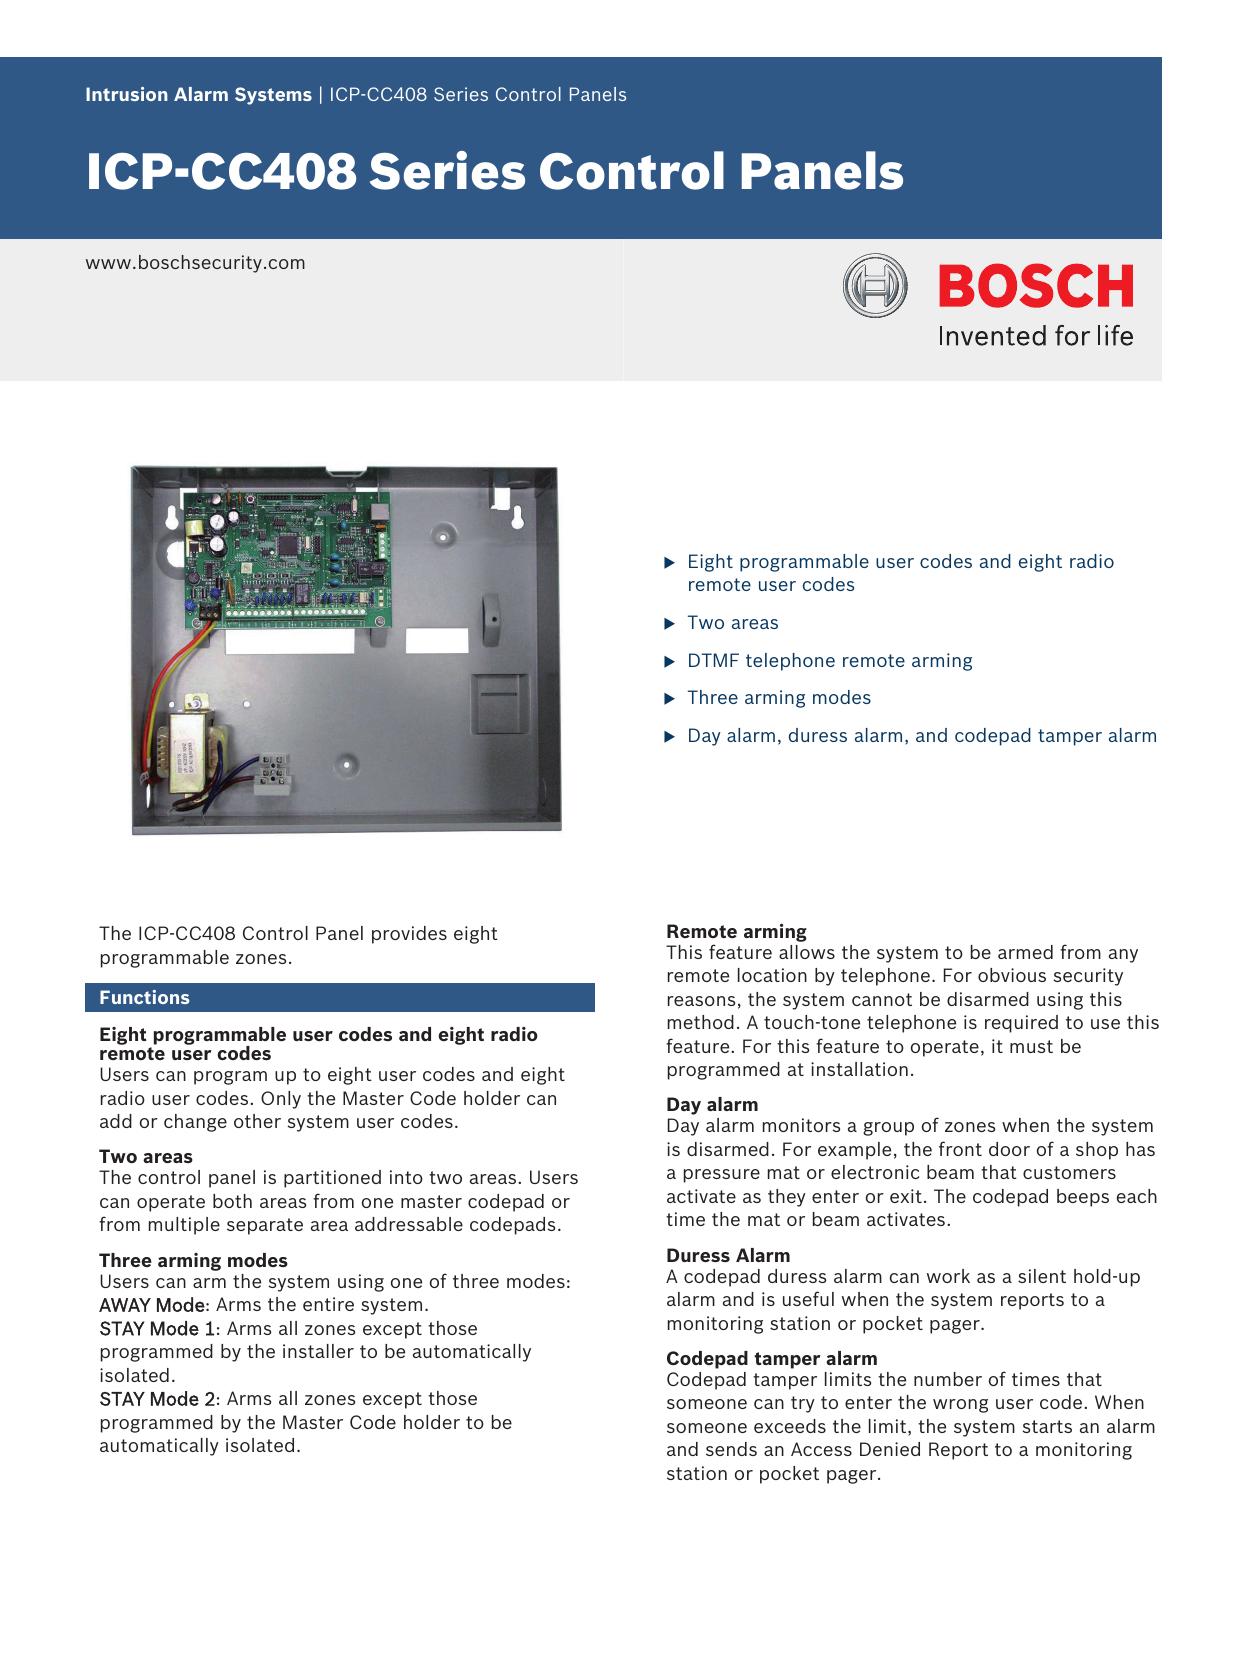 ICP‑CC408 Series Control Panels | manualzz com